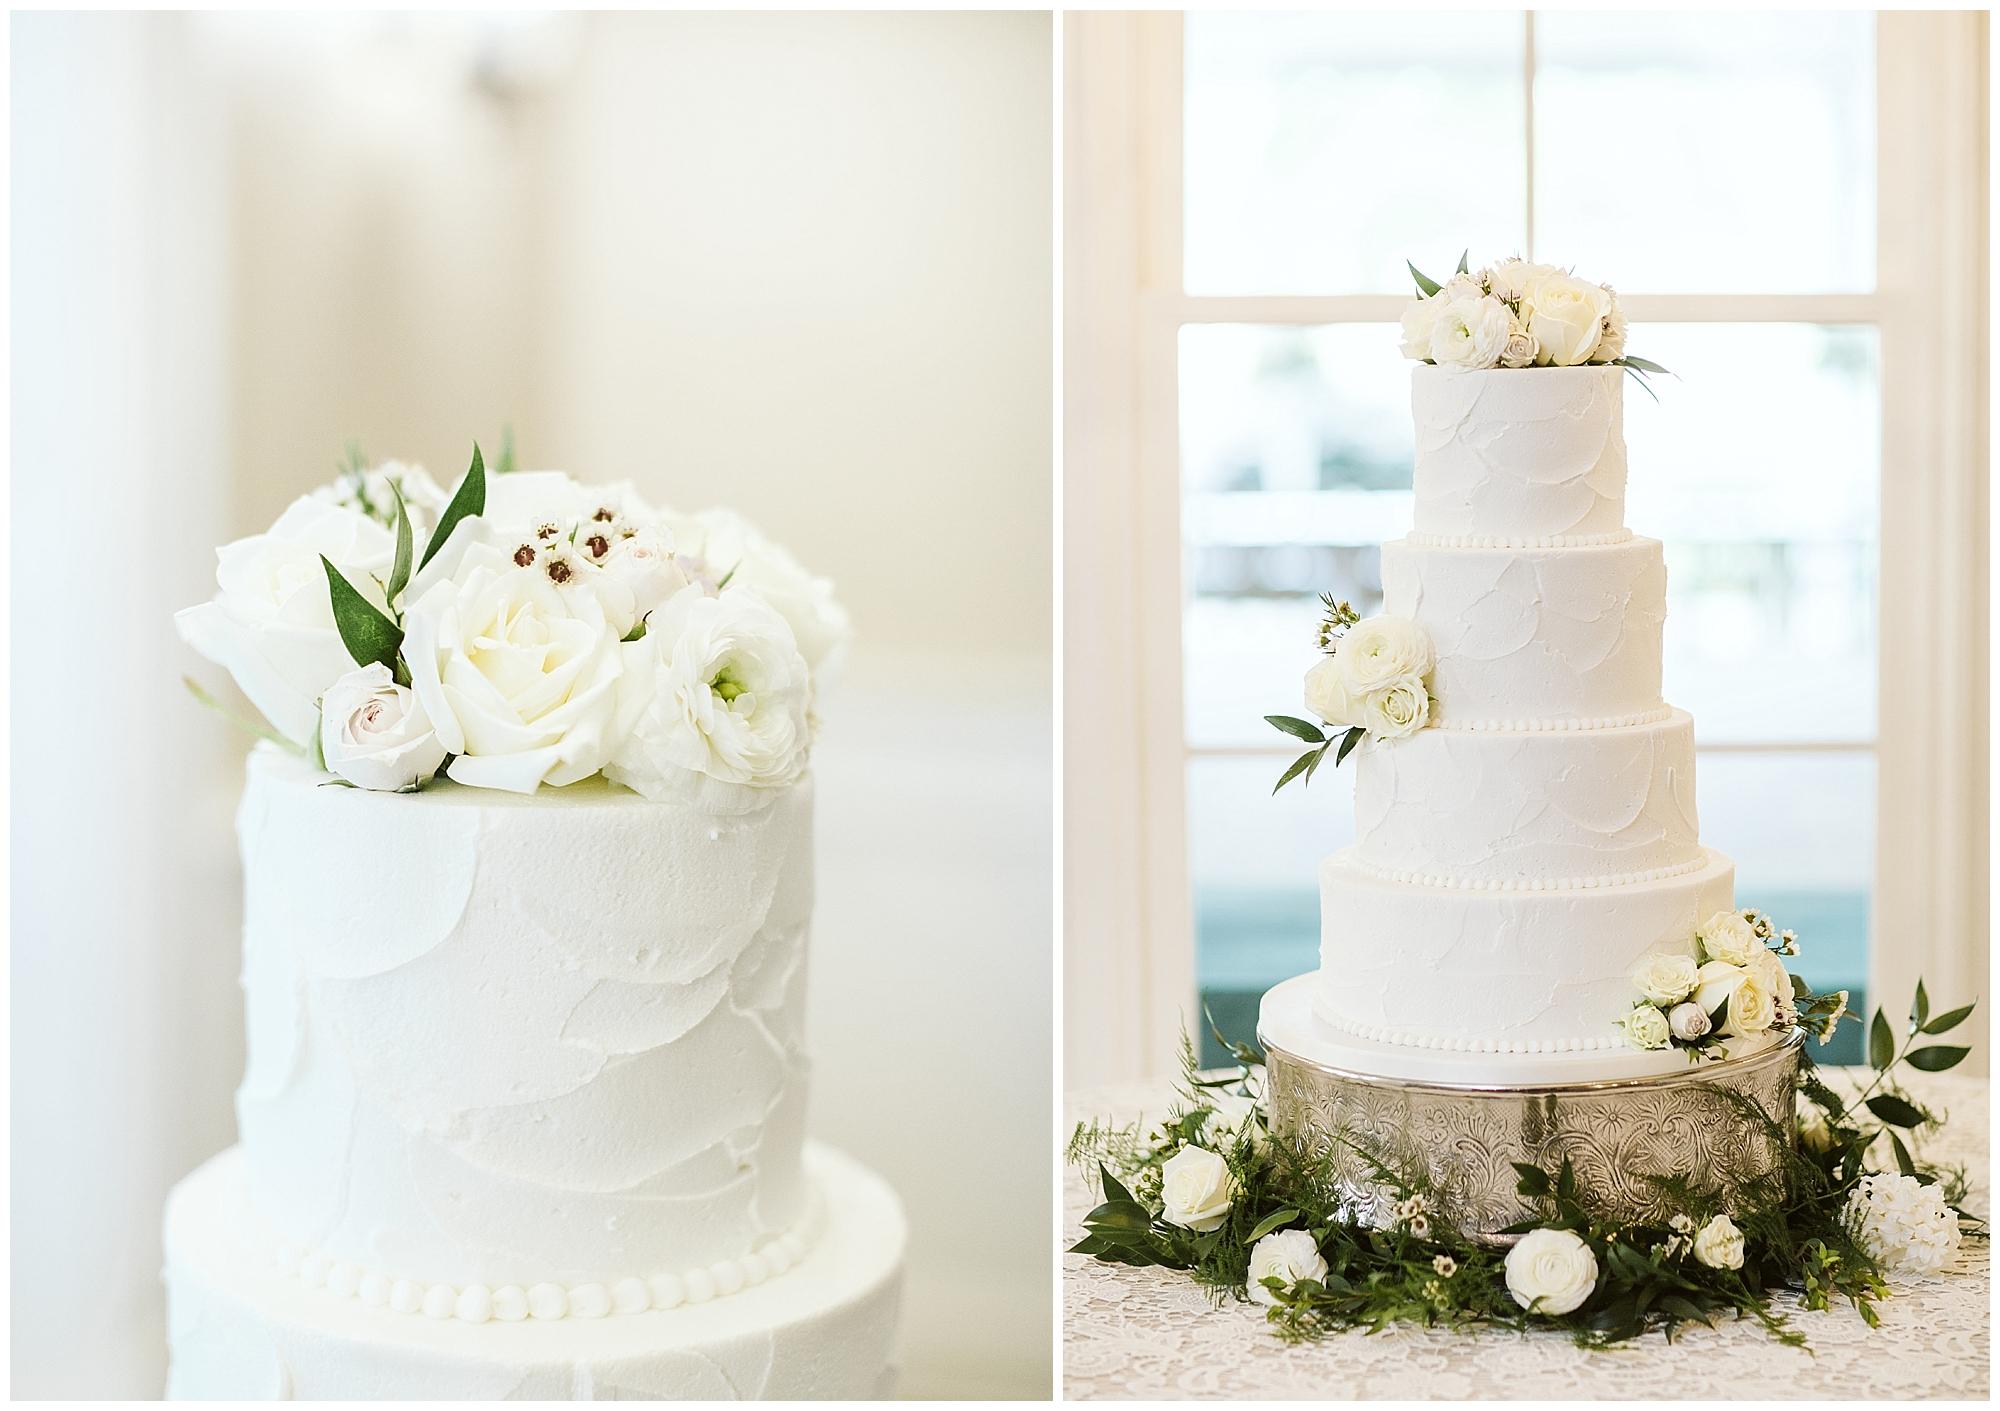 Oaks-at-salem-wedding-apex-photography-52.jpg